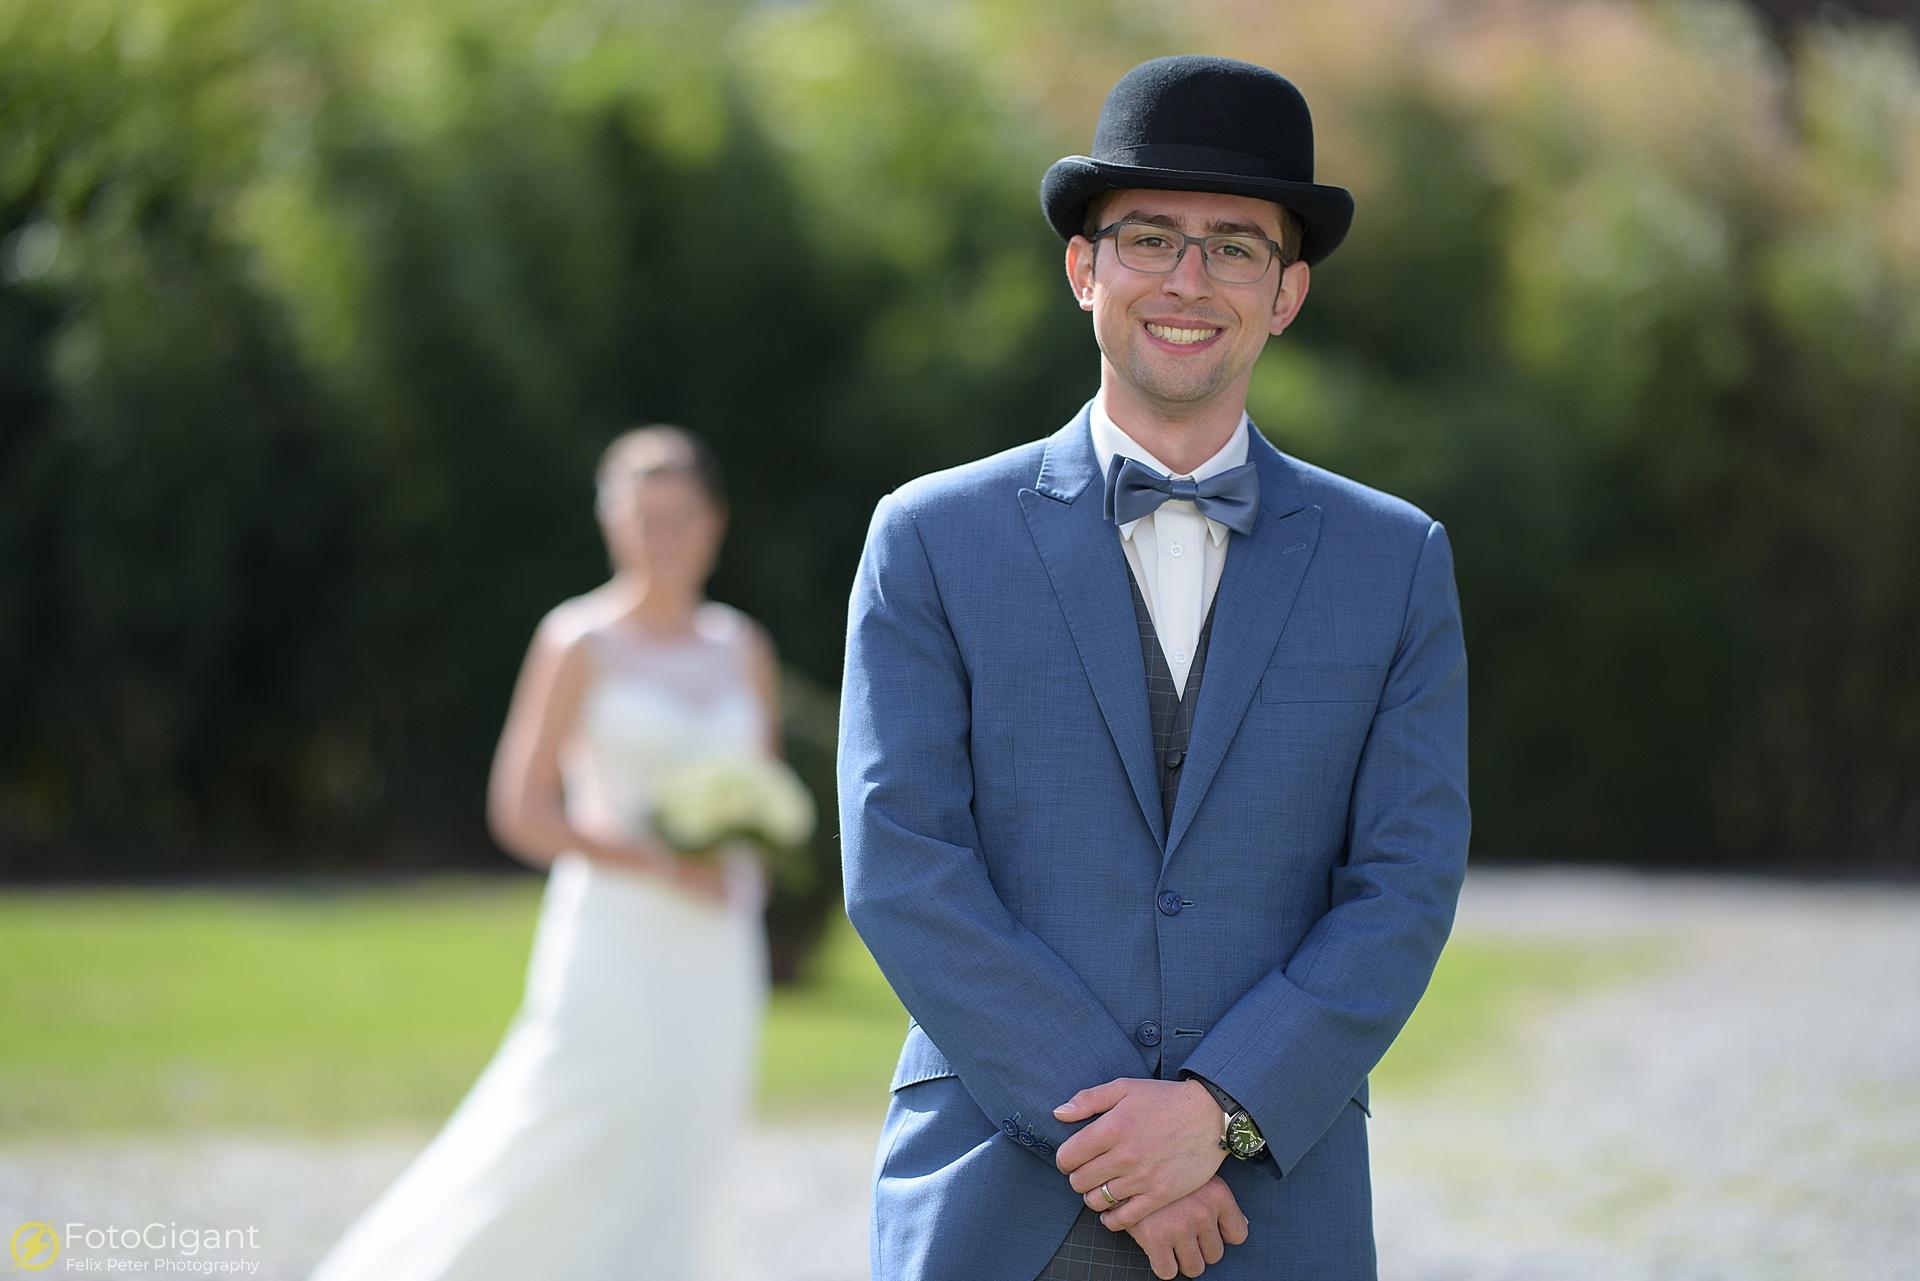 Hochzeitsfotografiekurs_Fotograf_Felix_Peter_13.jpg